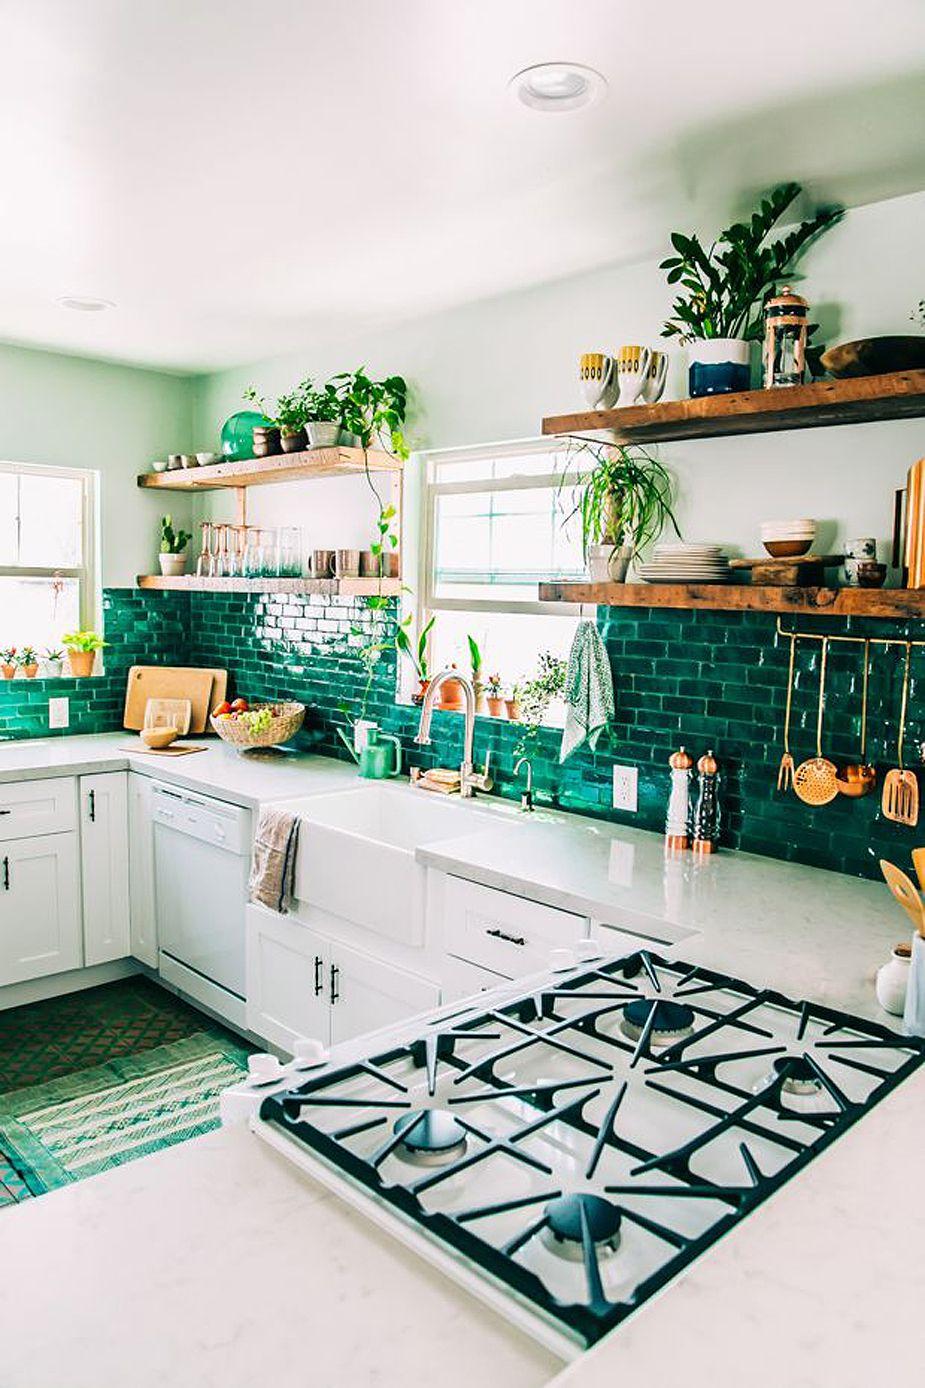 Whatu0027s Hot On Pinterest: Stunning Boho Home Decor